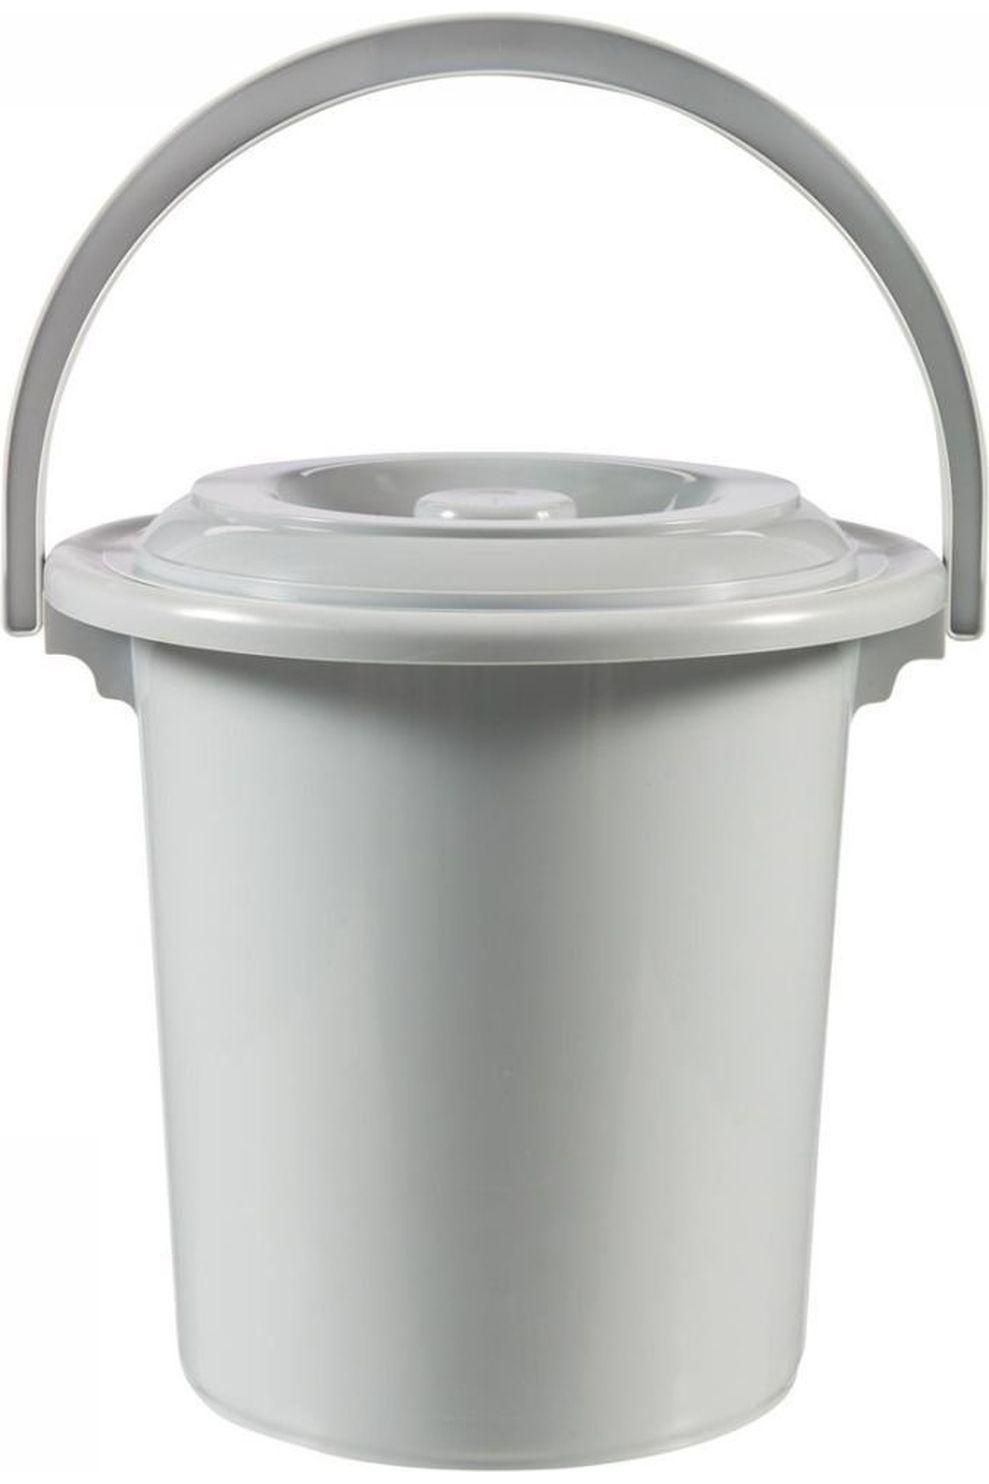 Curver Toilet Acc Toiletemmer Met Deksel 10 Liter - Grijs